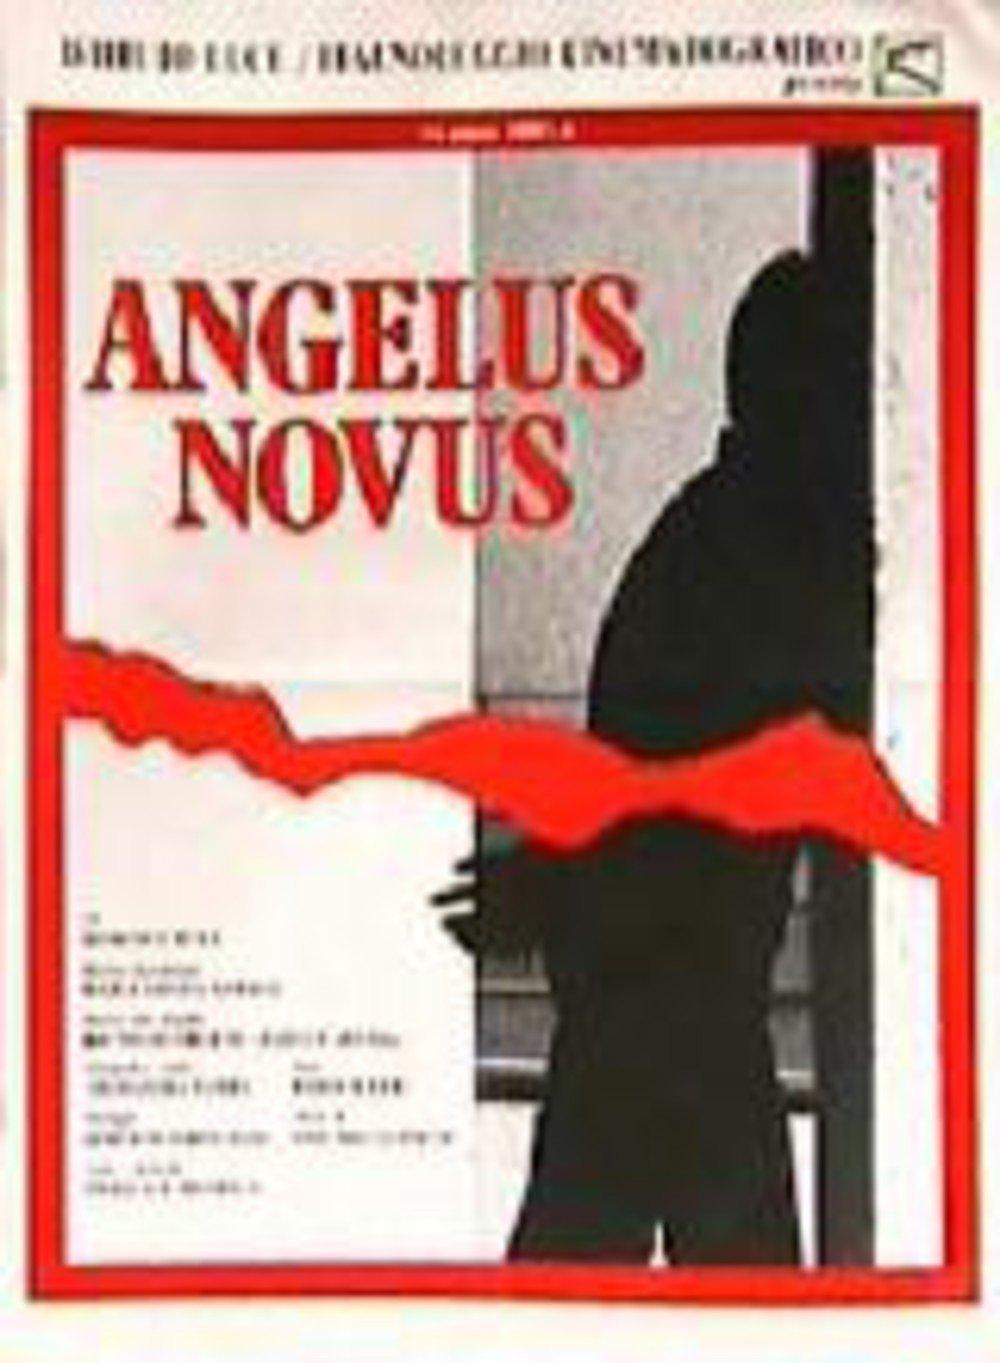 Angelus novus ((1987))